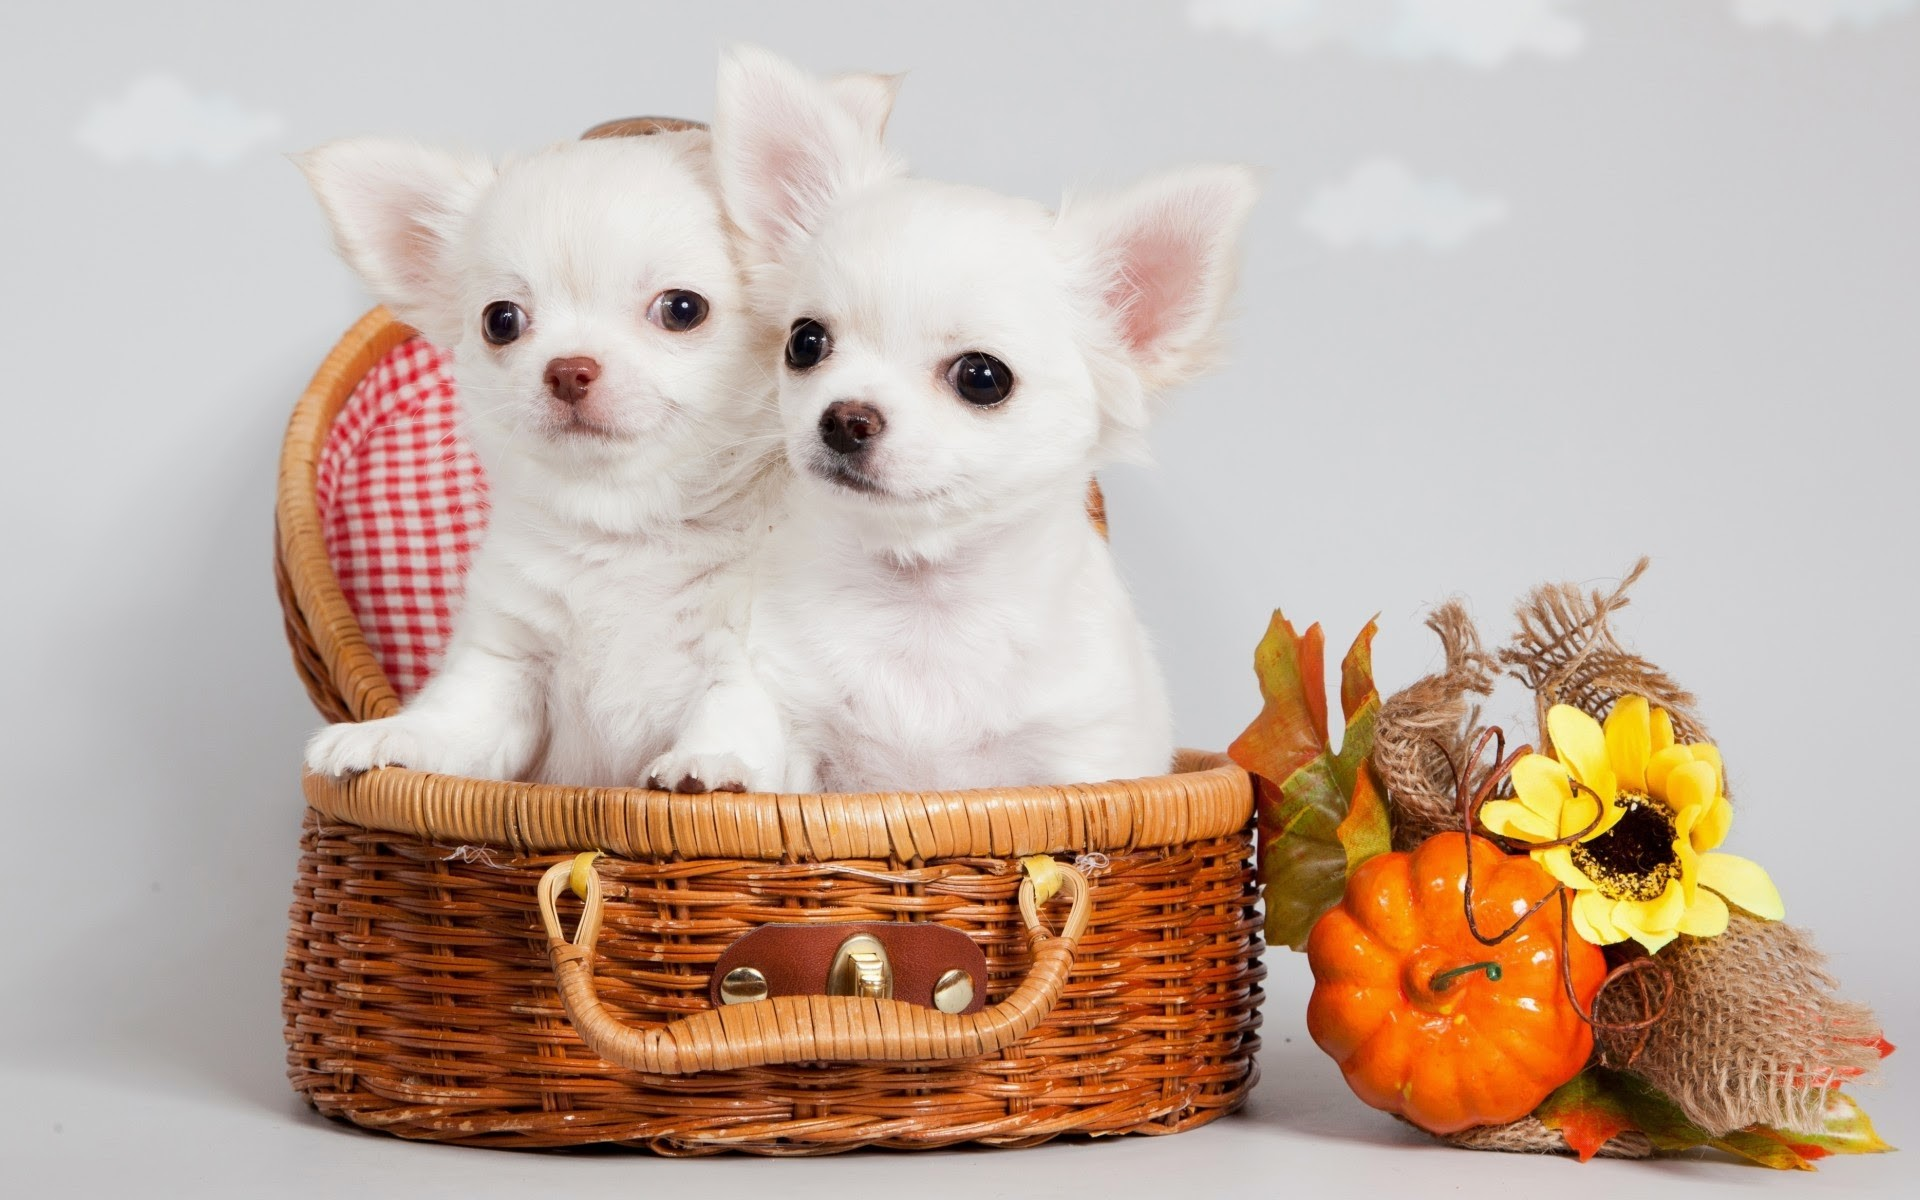 Imagenes De Perritos Chihuahua En Hd Gratis Para Poner En El Celular 6 HD  Wallpapers